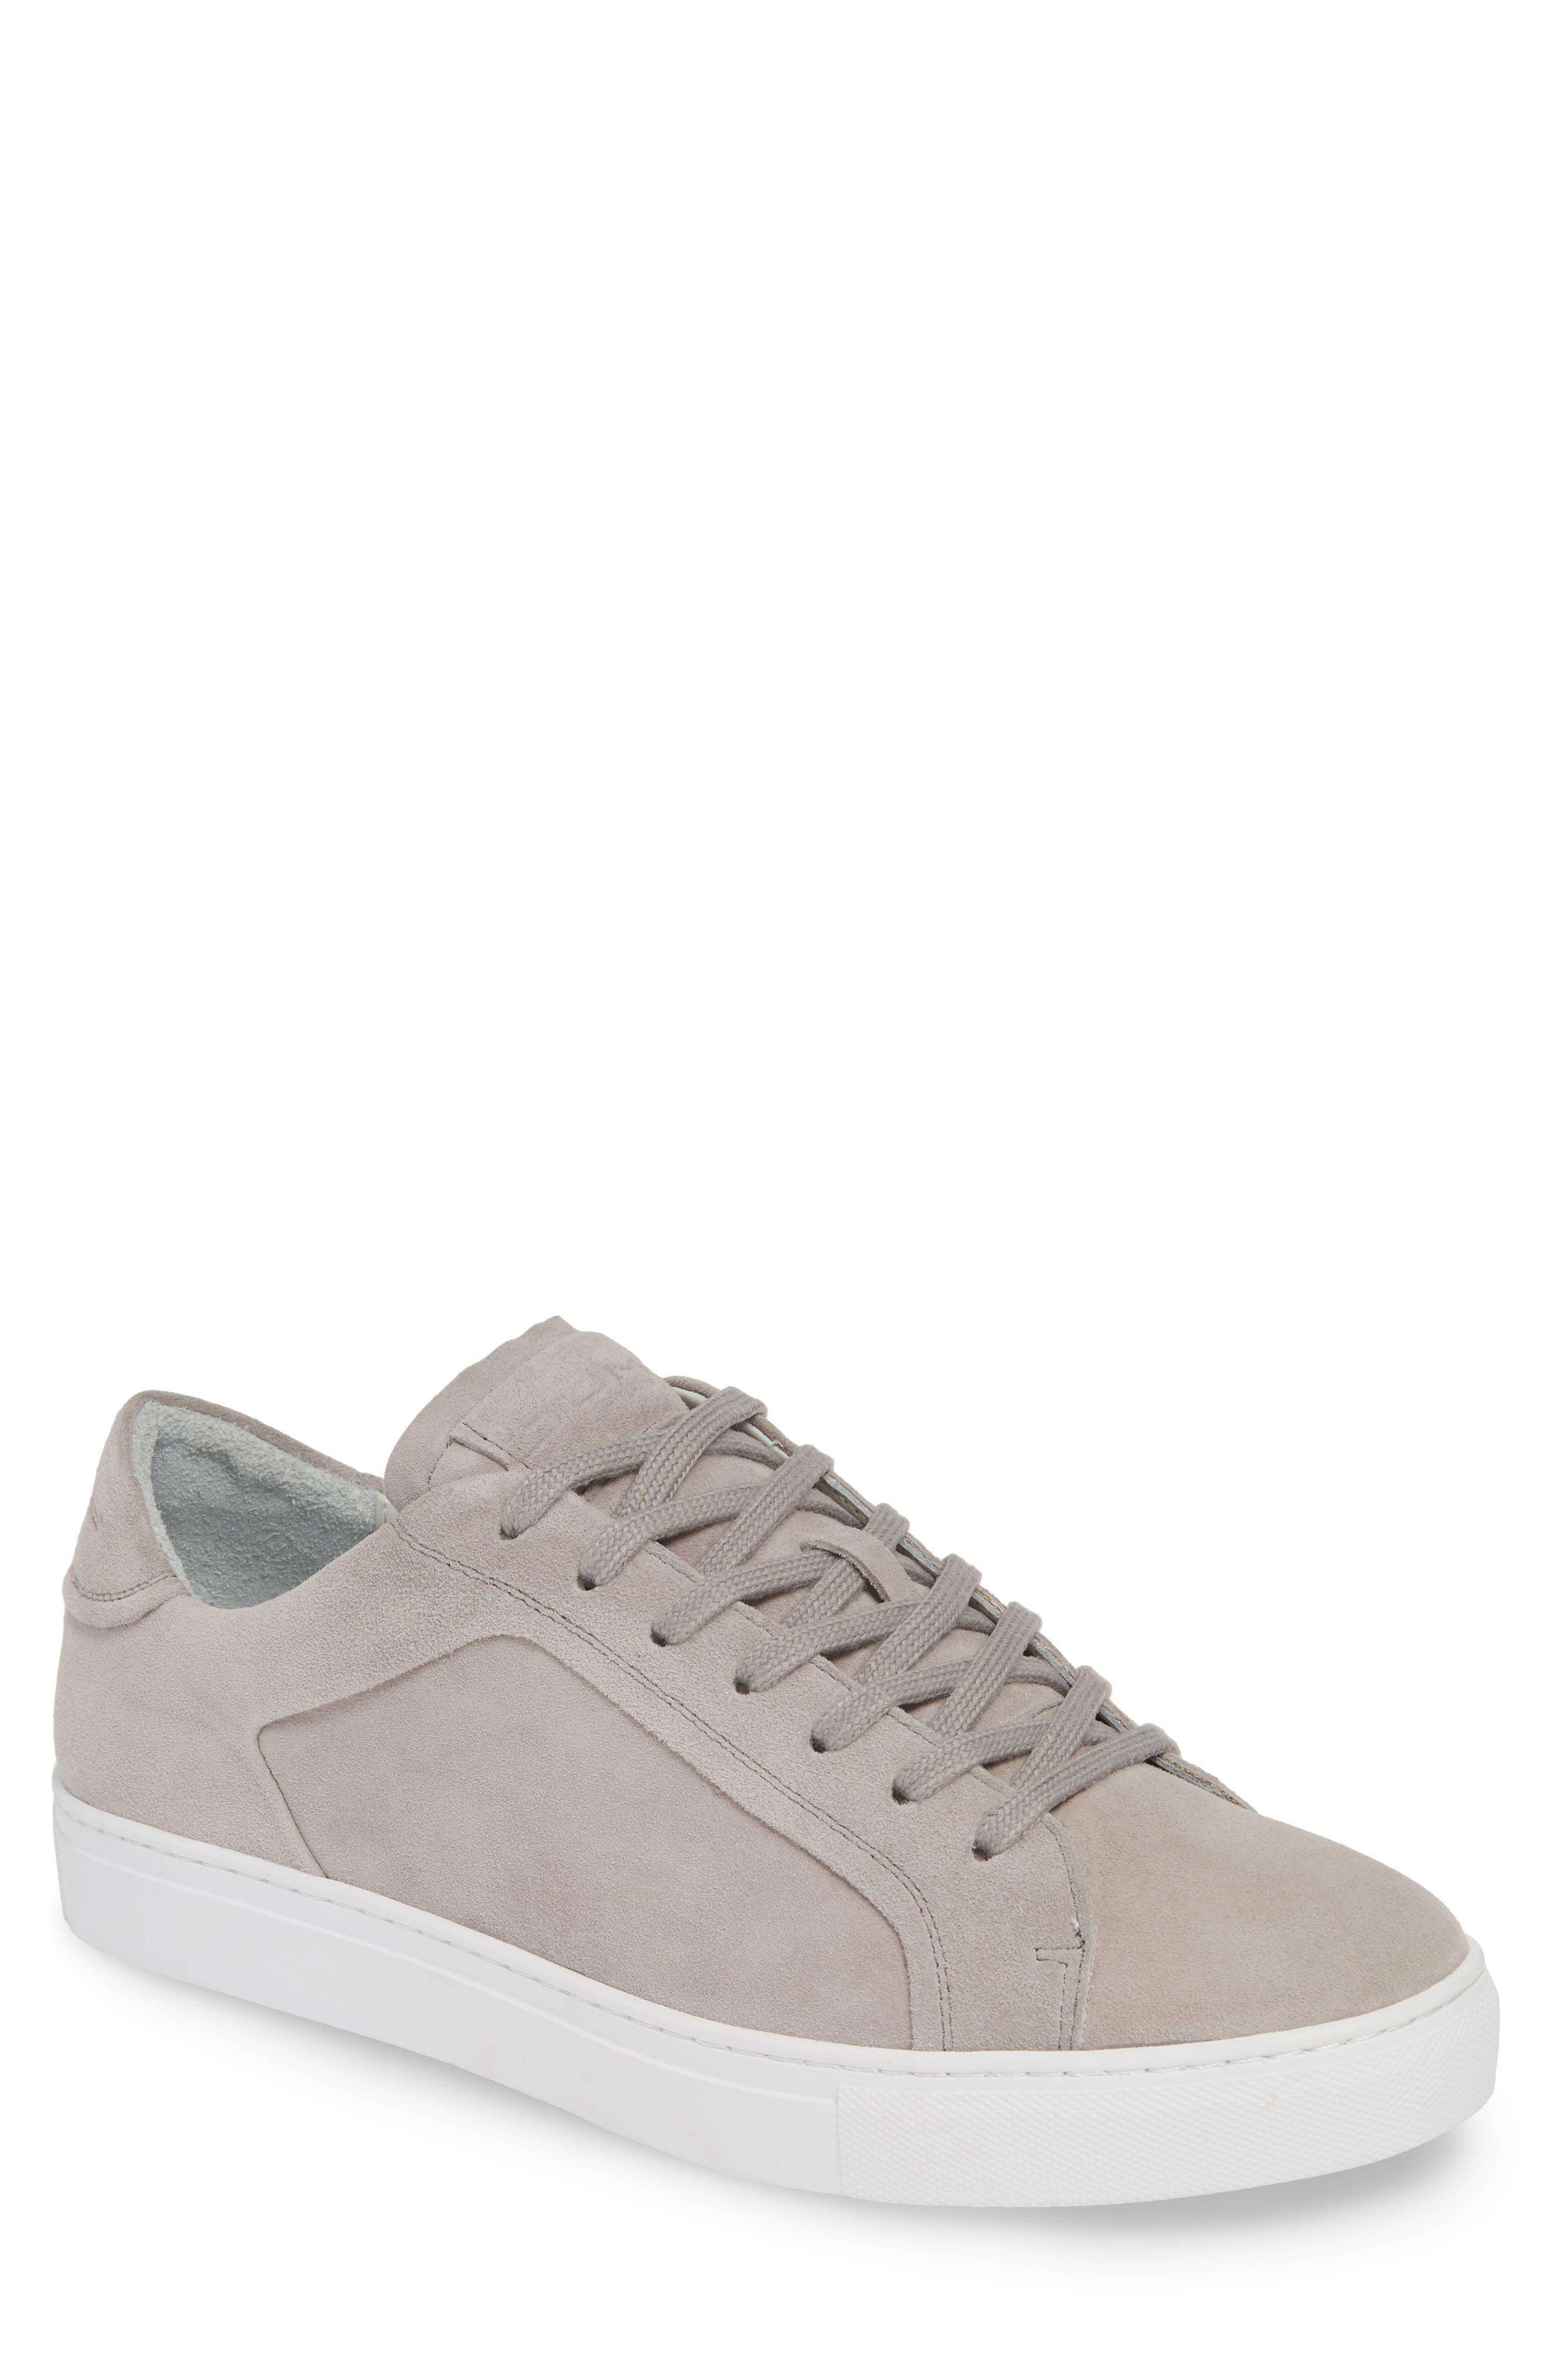 JUMP Bloke Sneaker, Main, color, GREY SUEDE